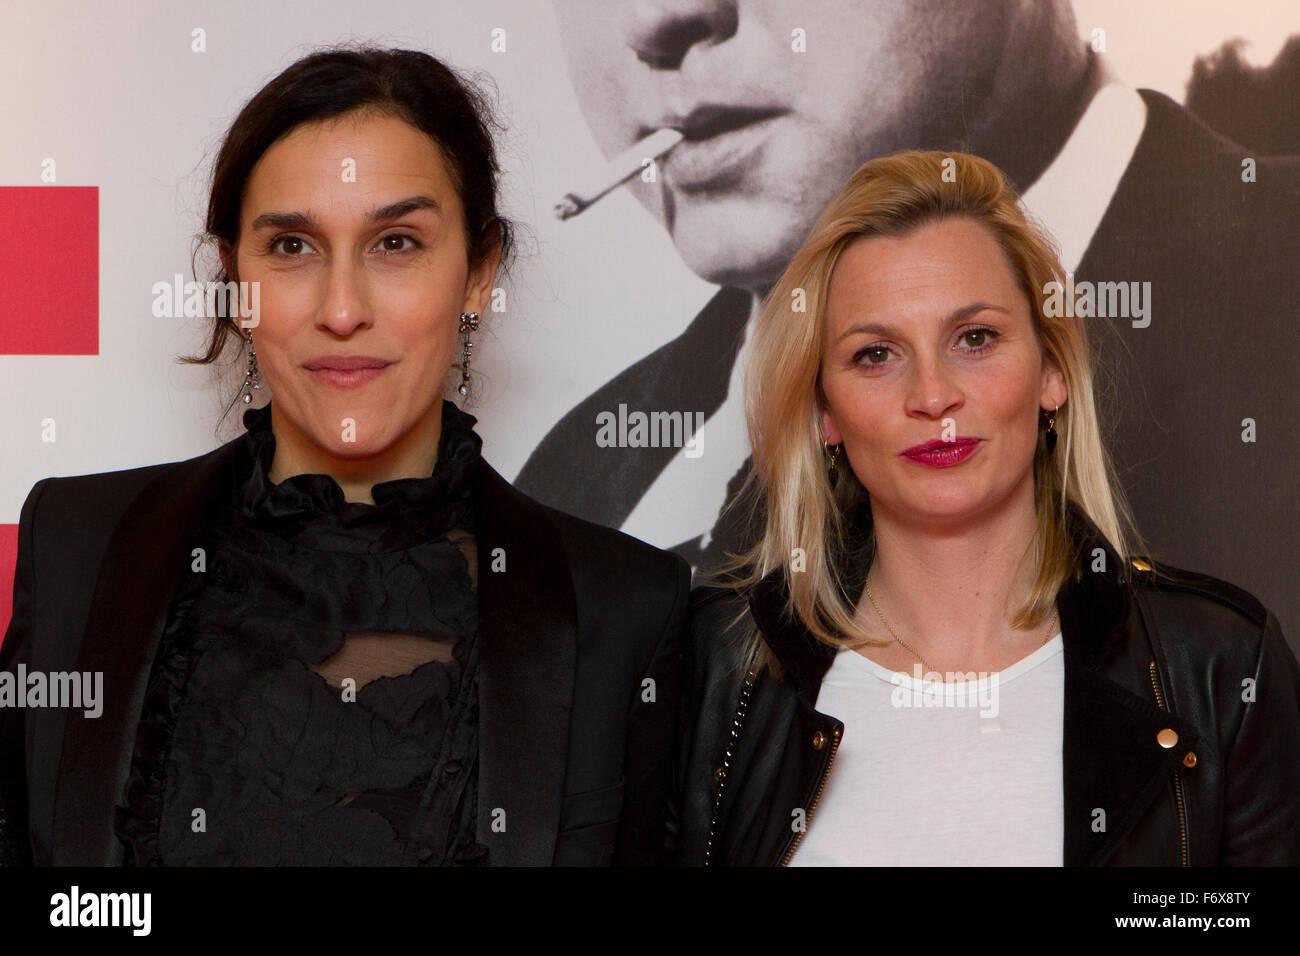 Torino, Italy. 20th November 2015. British film director Sarah Gavron (left) with producer Faye Ward (right) on - Stock Image